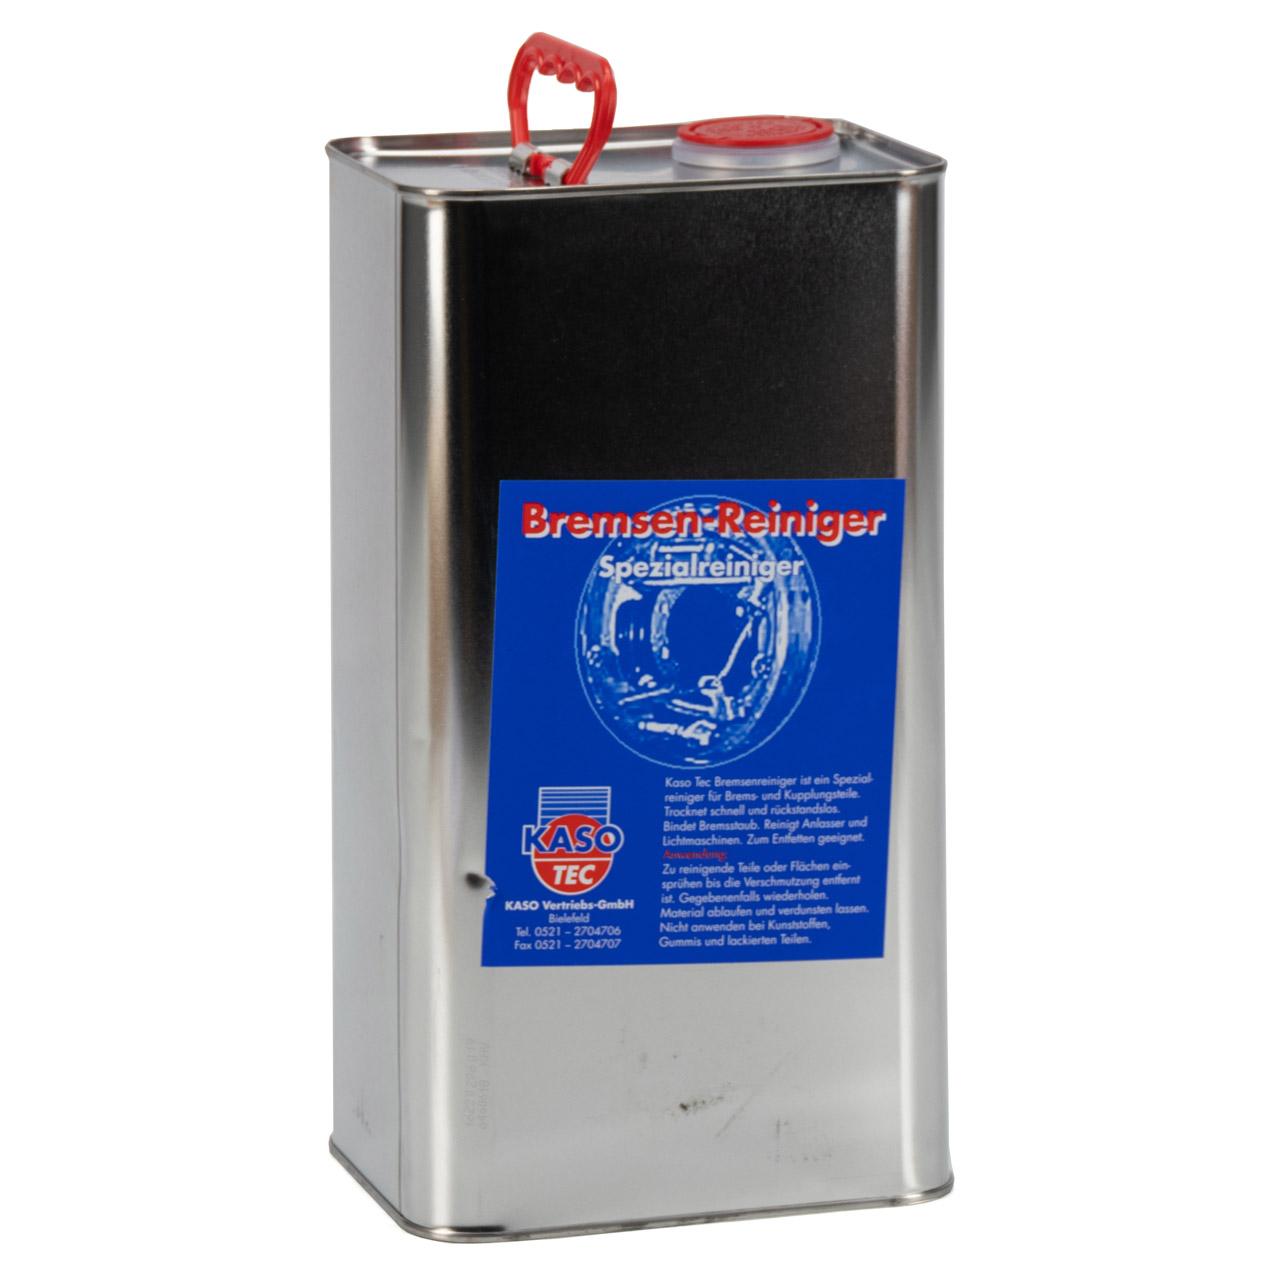 KASOTEC Bremsenreiniger Bremsen Entfetter Montagereiniger Acetonfrei 5L 5 Liter